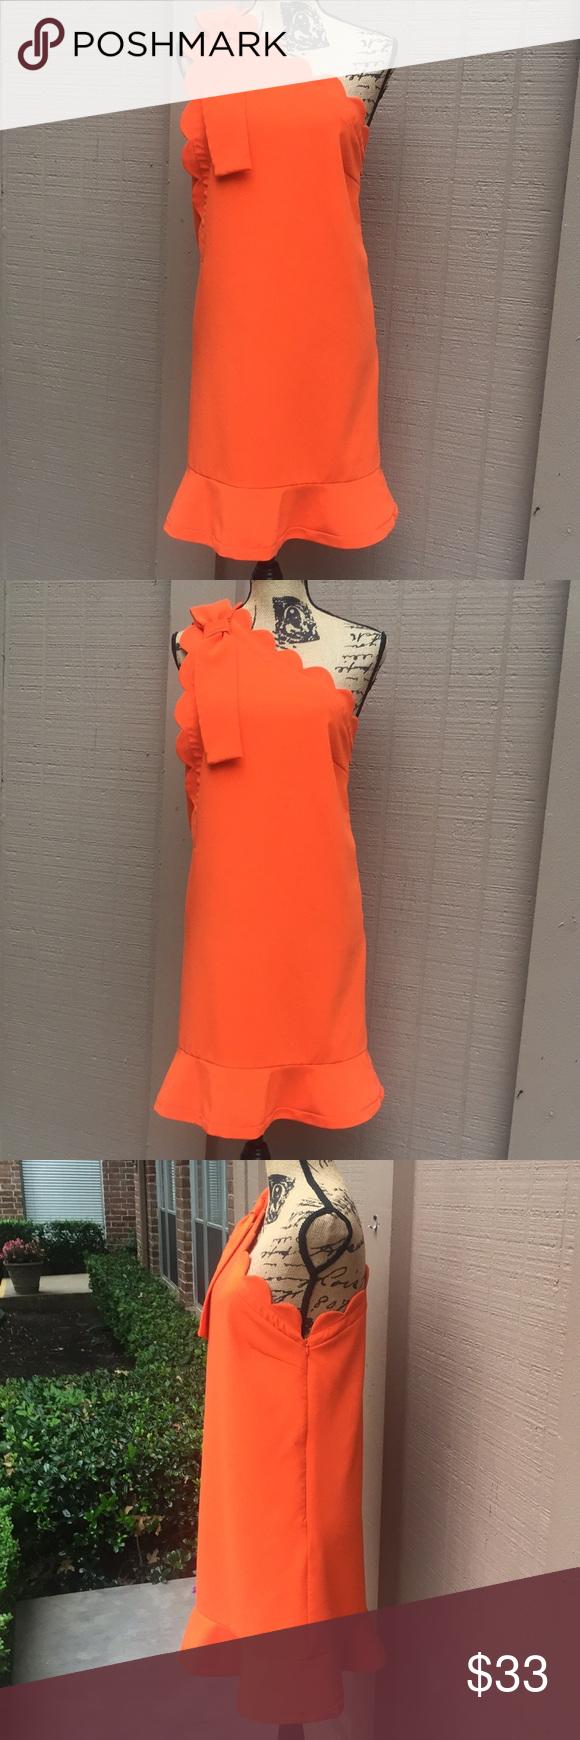 Sz M Victoria Beckham Orange Dress Euc Orange Dress Victoria Beckham Victoria Beckham Target [ 1740 x 580 Pixel ]